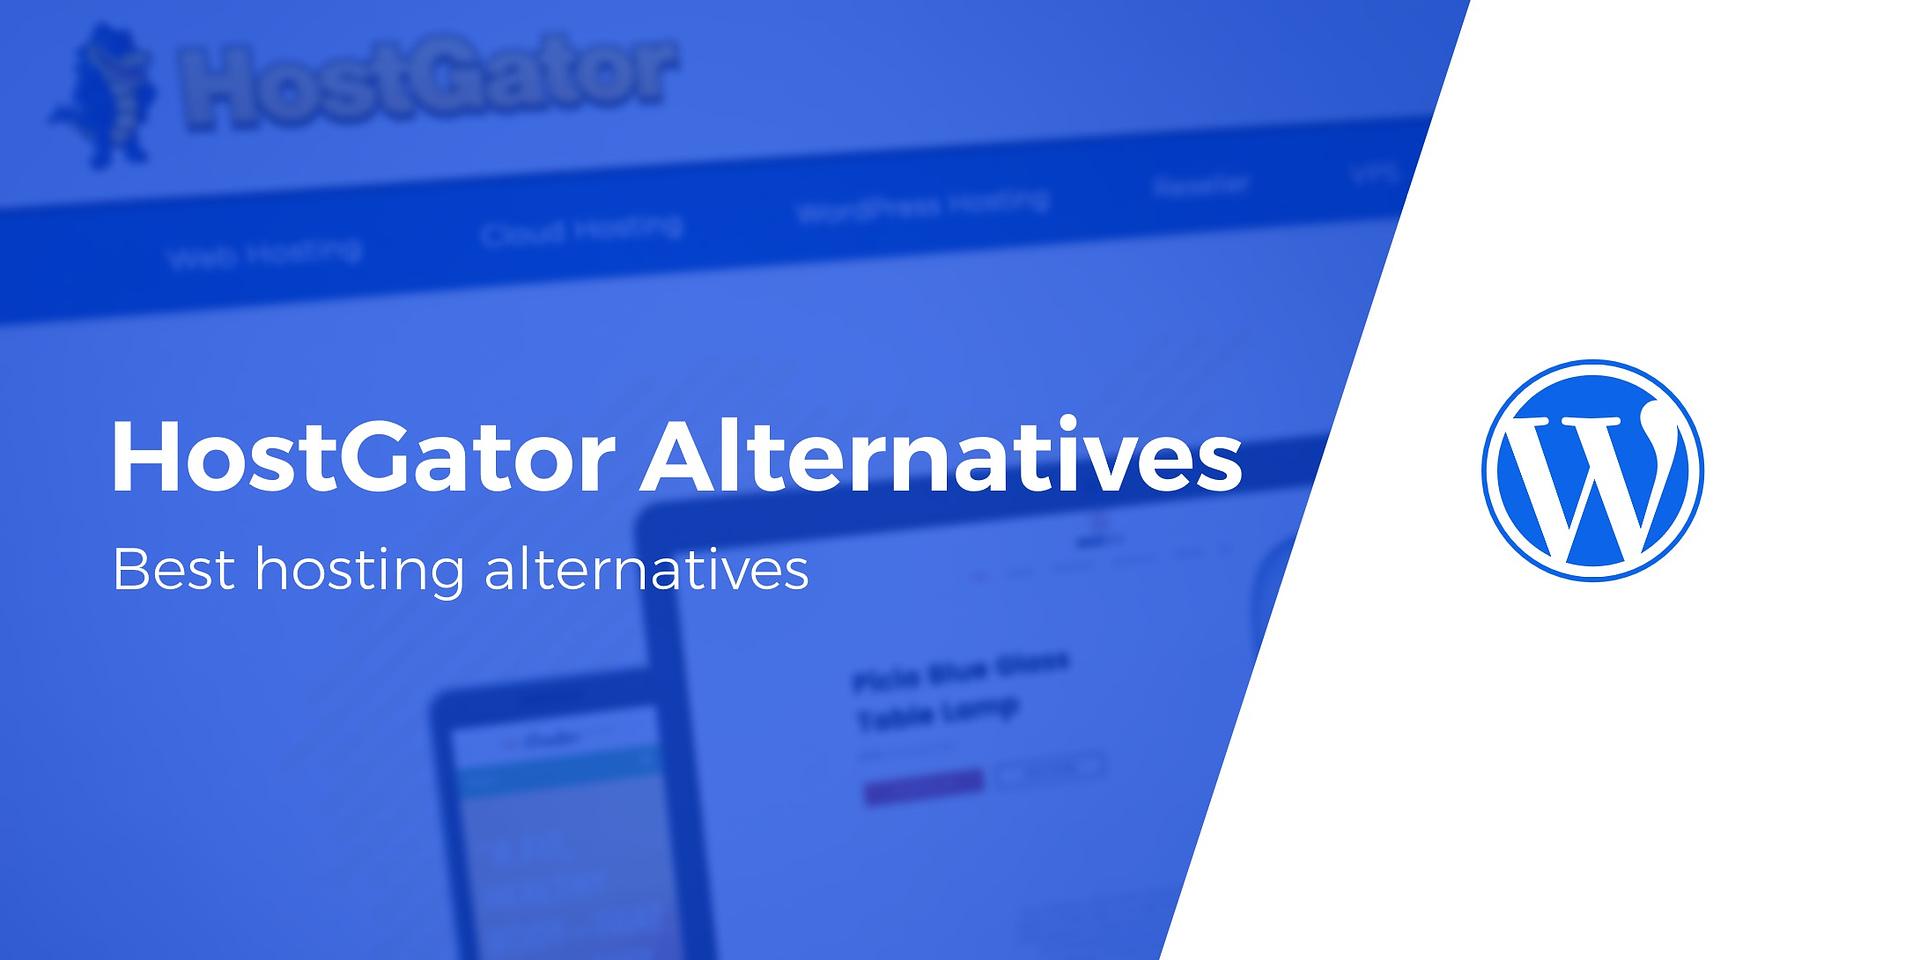 10+ Best HostGator Alternatives & Similar Sites Like HostGator 2021